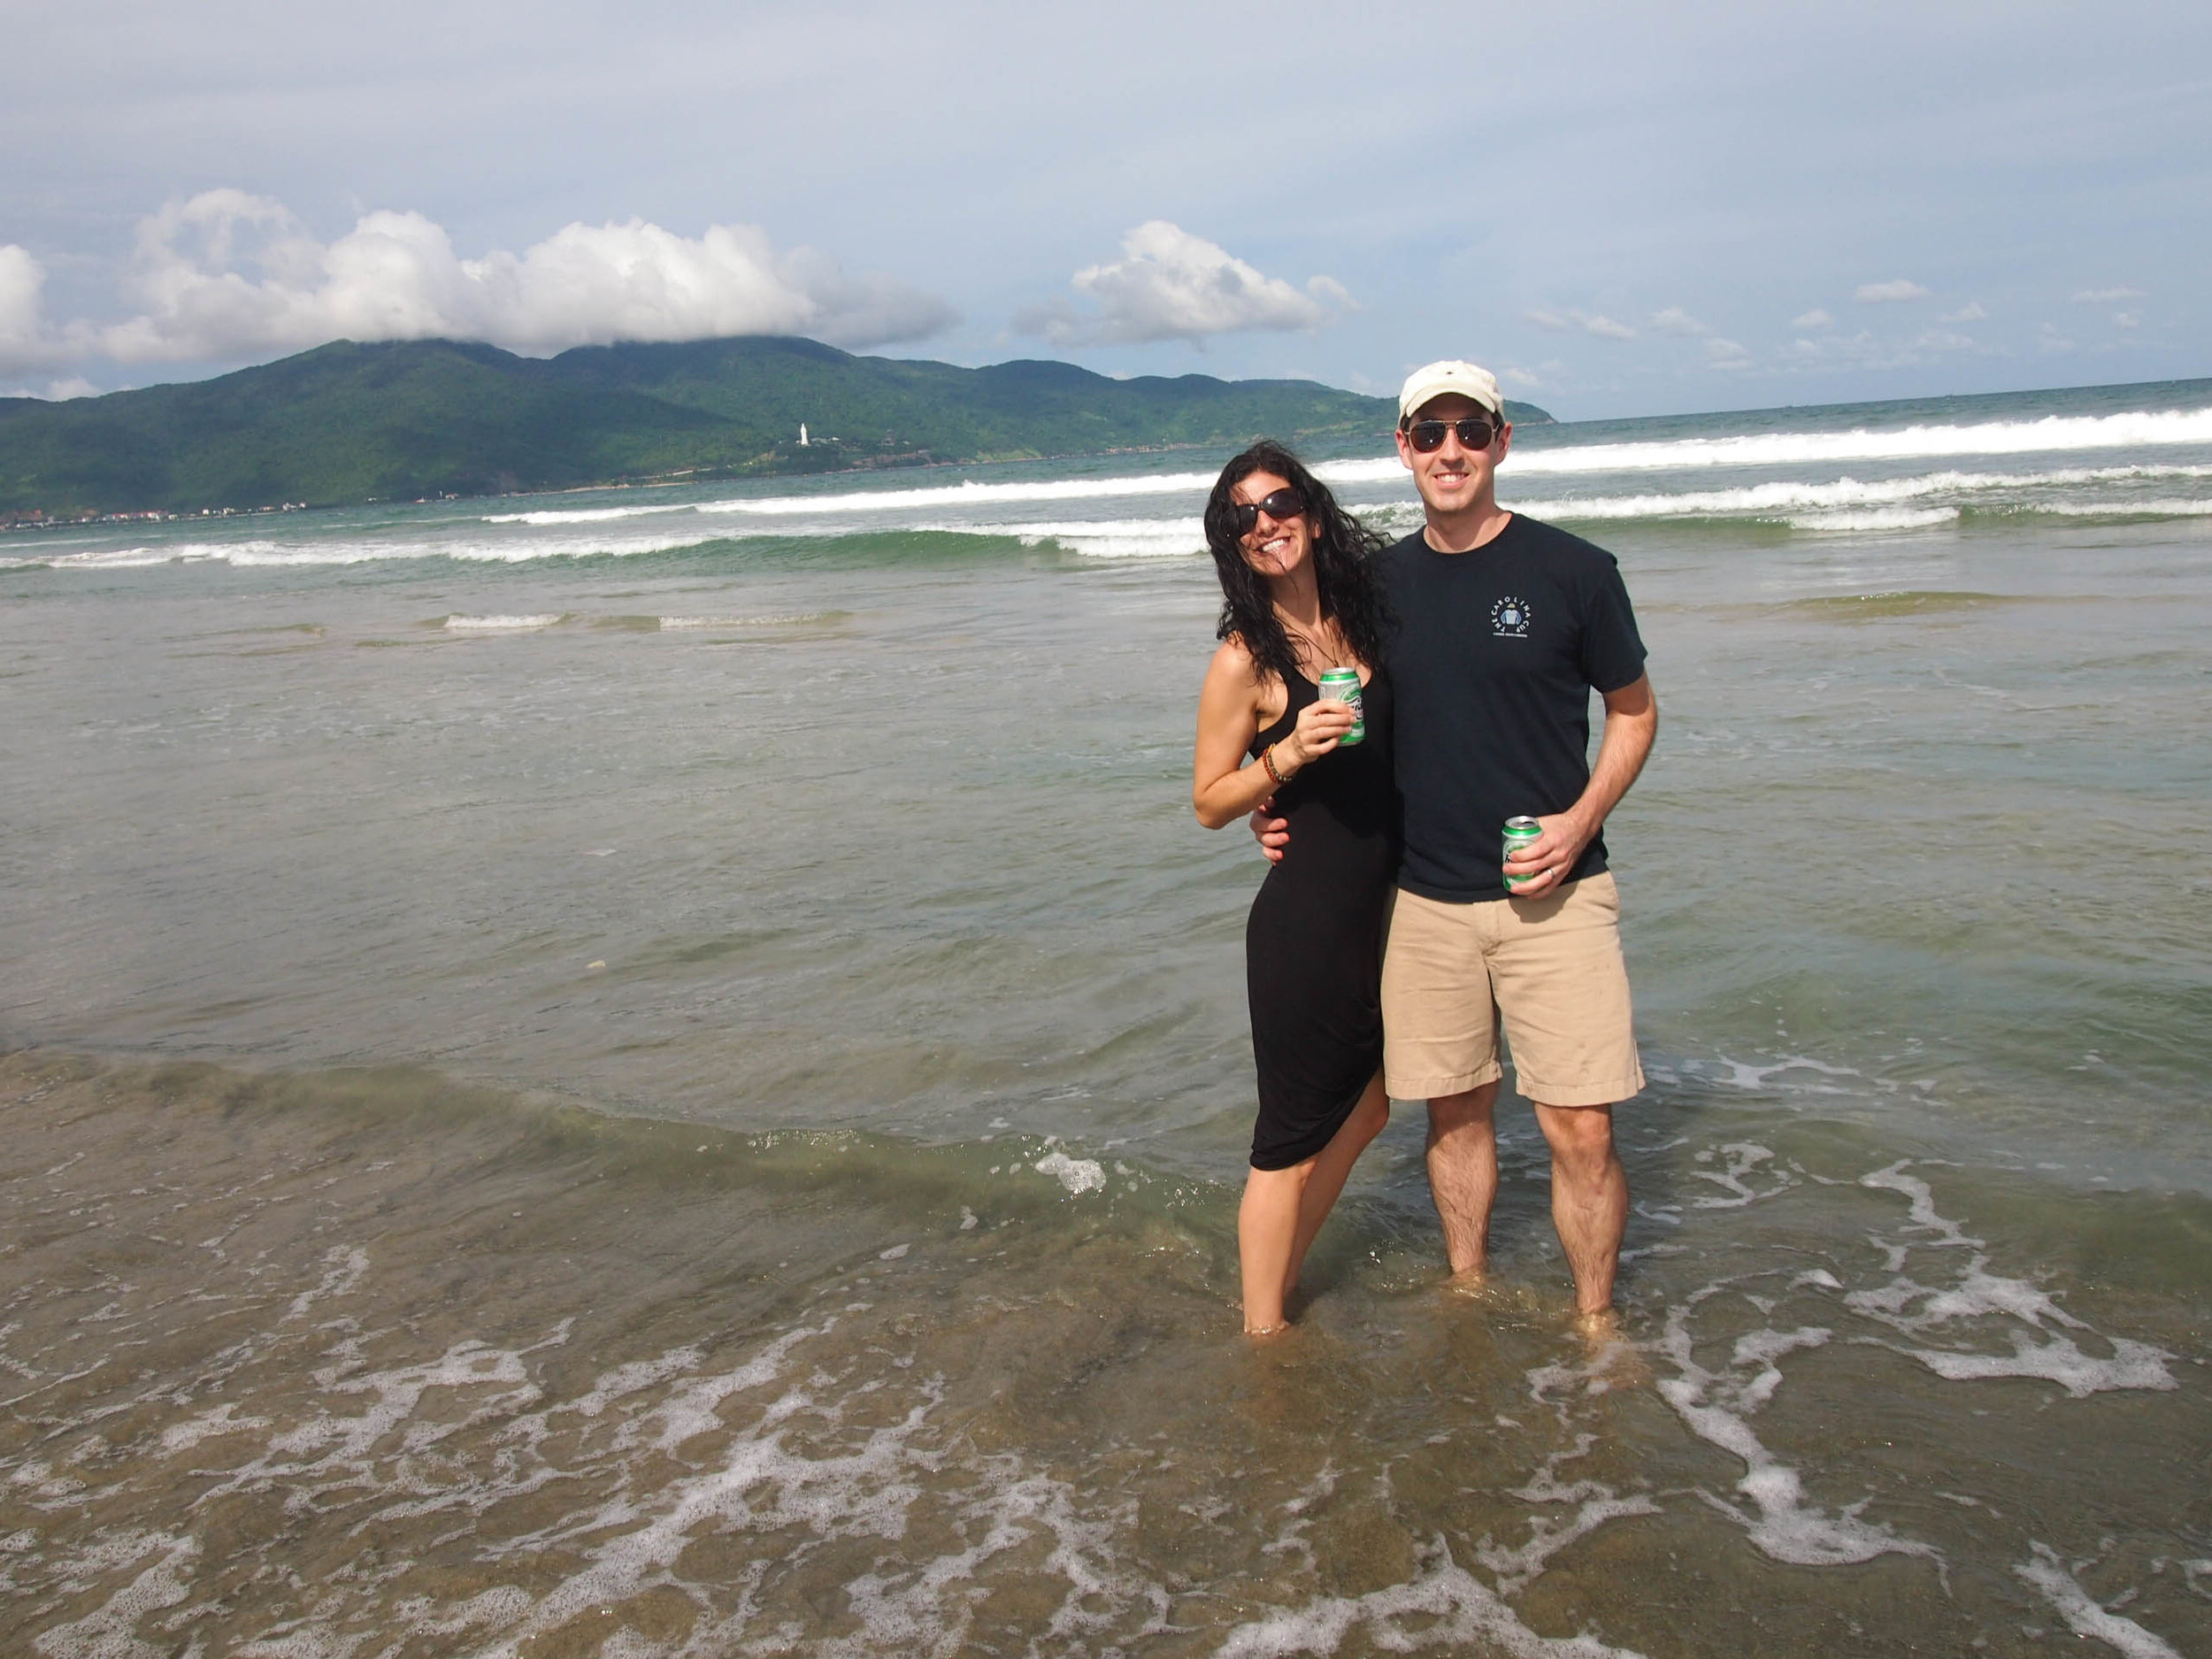 Beer break on China Beach